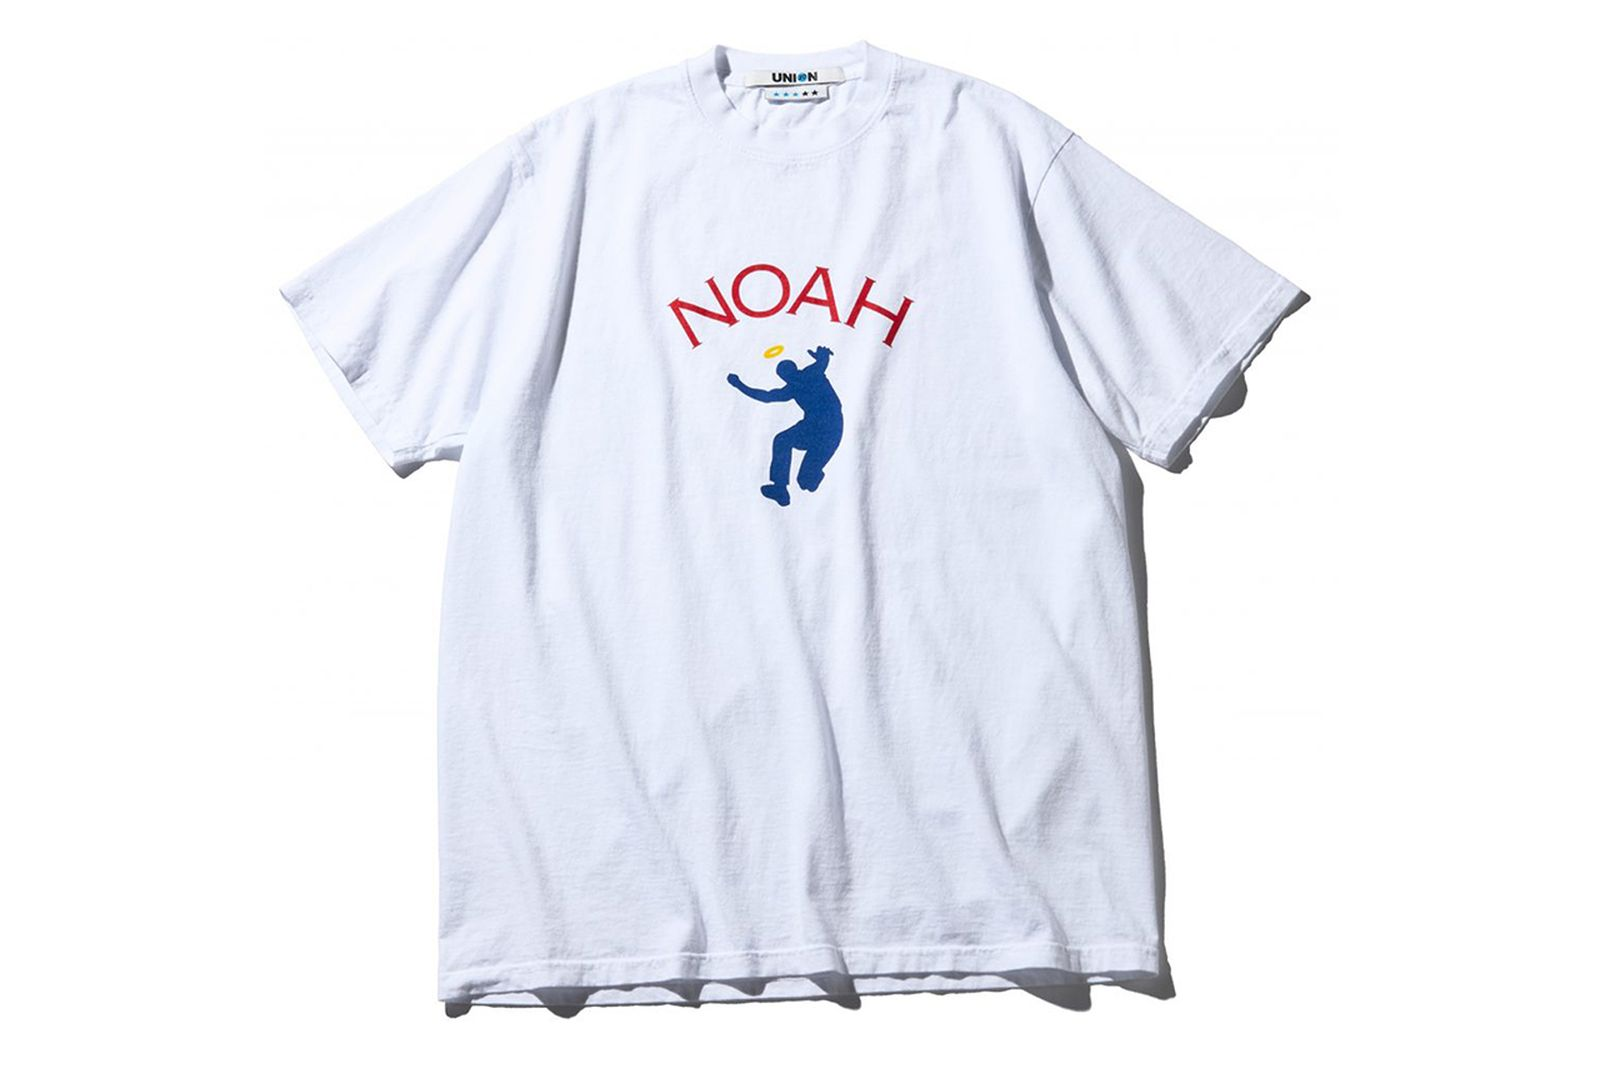 union-noah-30-anniversary-capsule-6